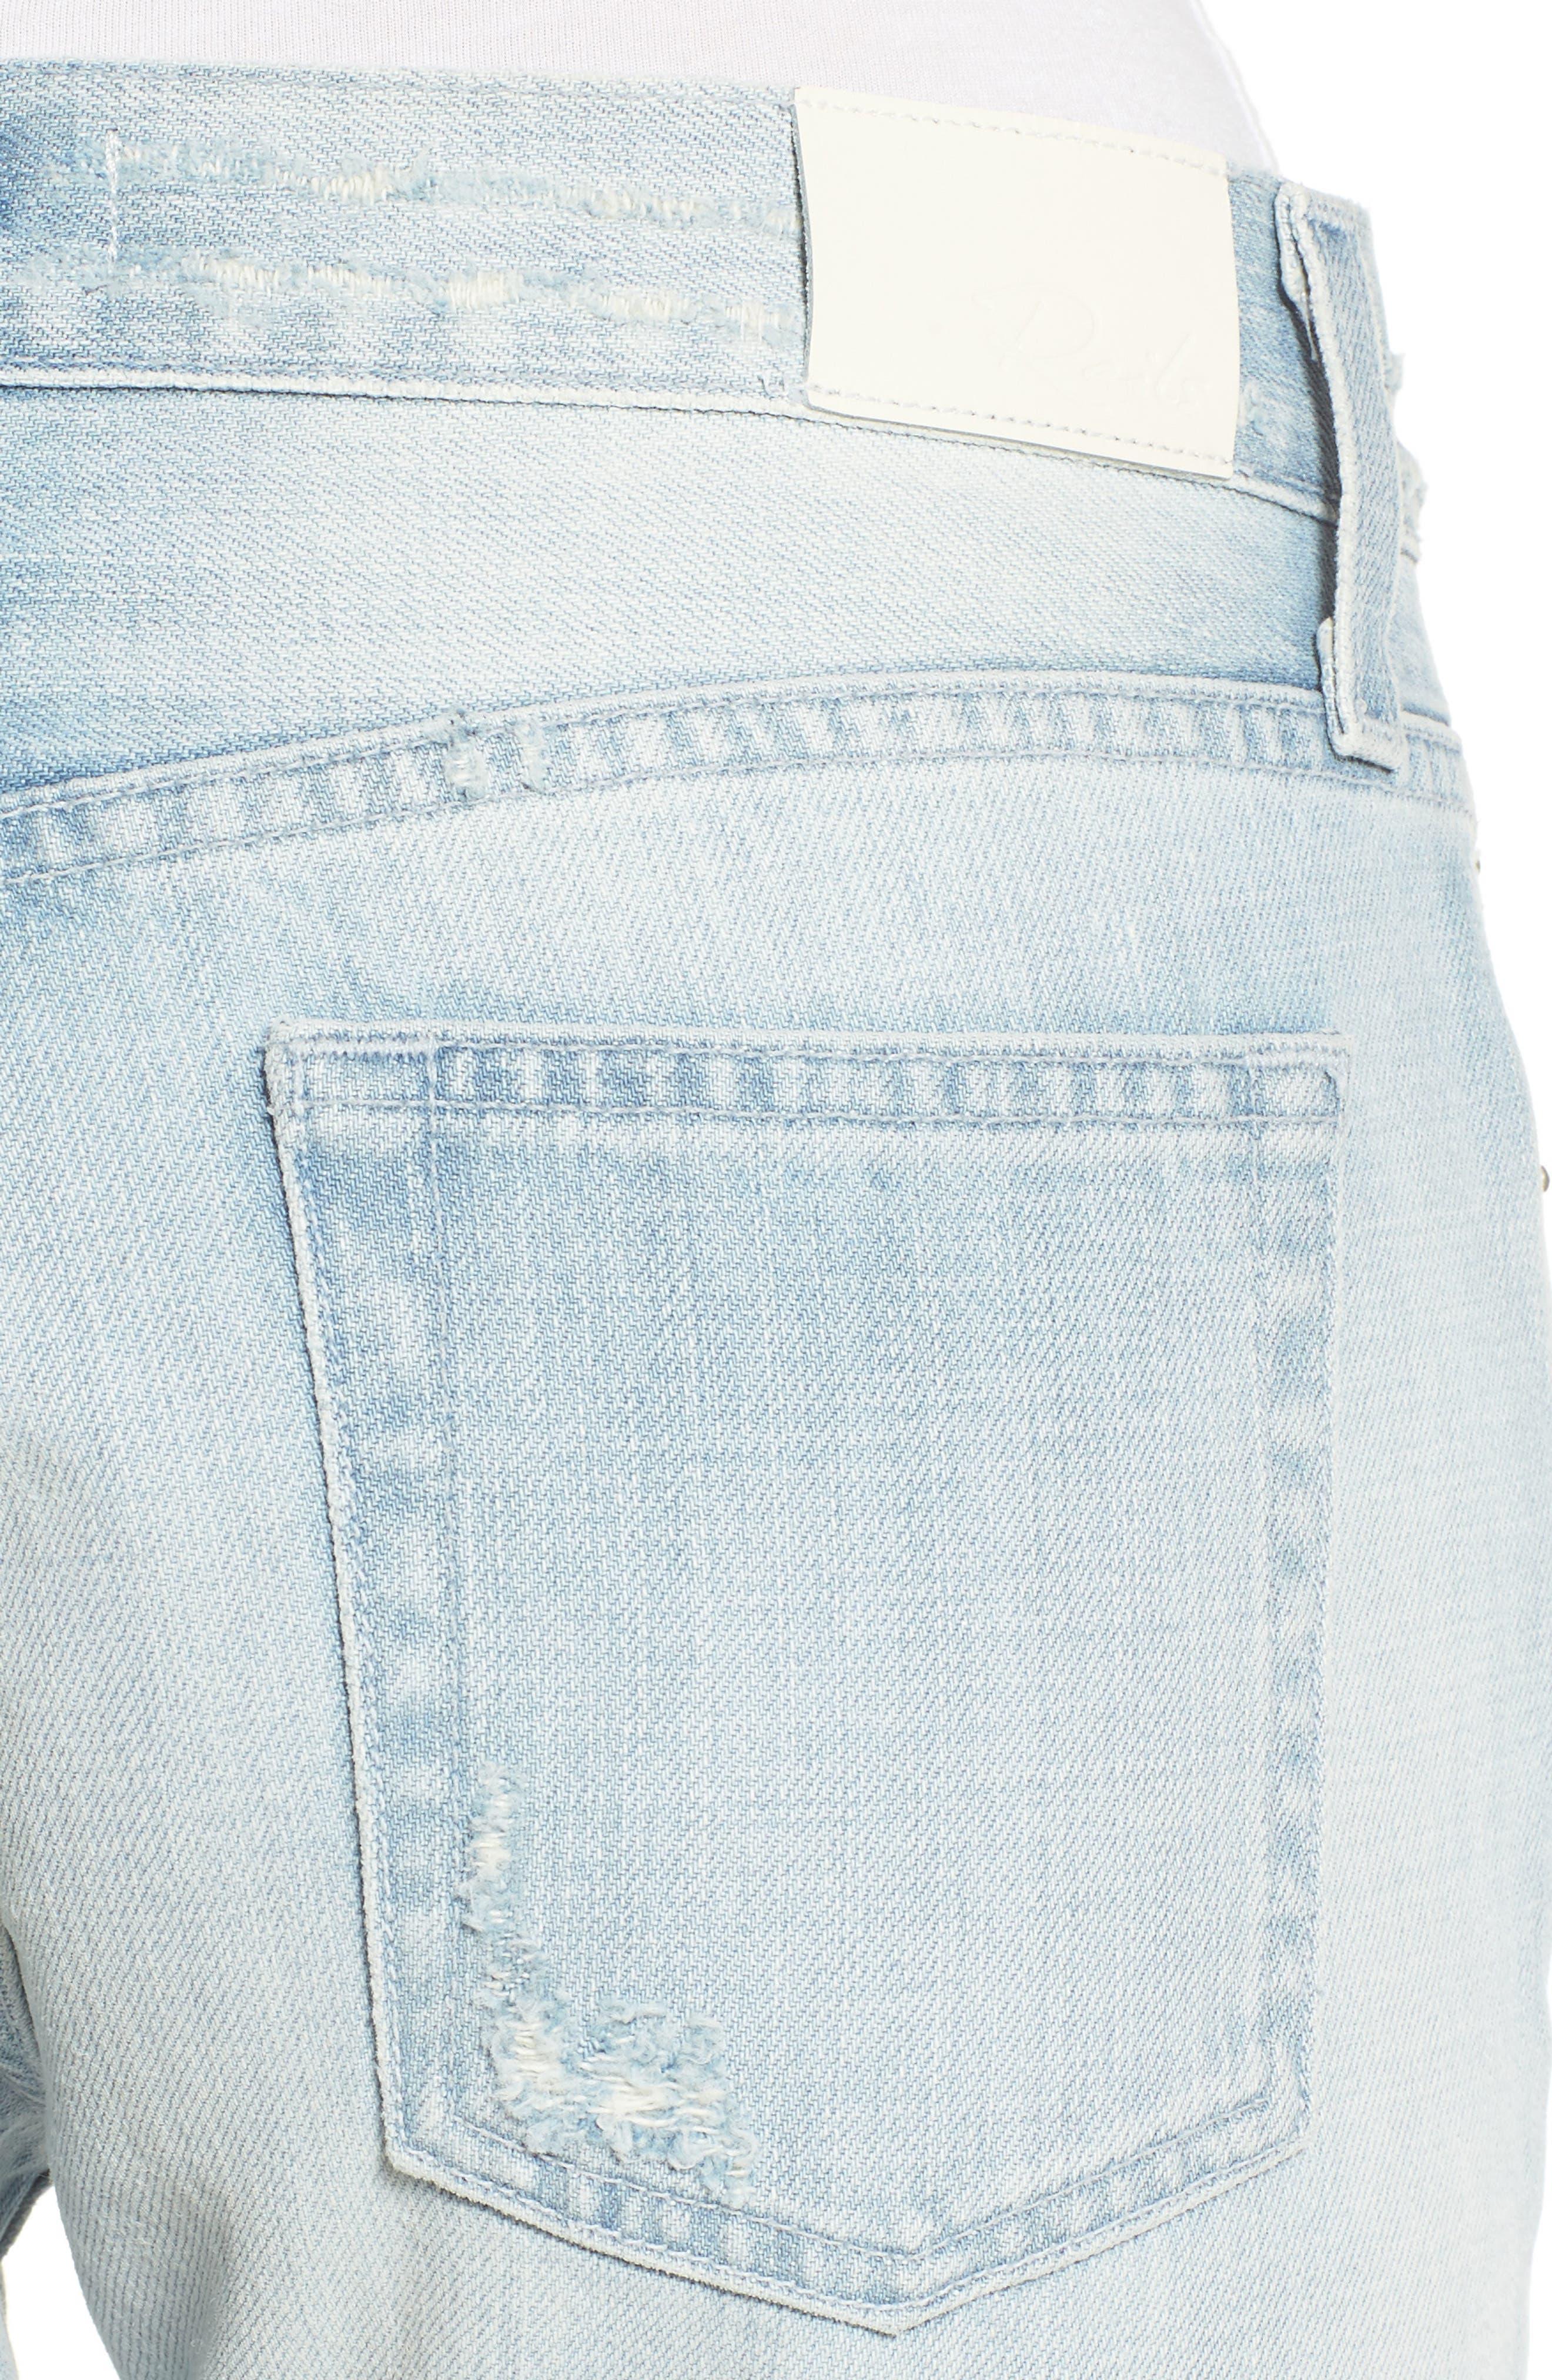 Beckett Distressed Boyfriend Jeans,                             Alternate thumbnail 4, color,                             429